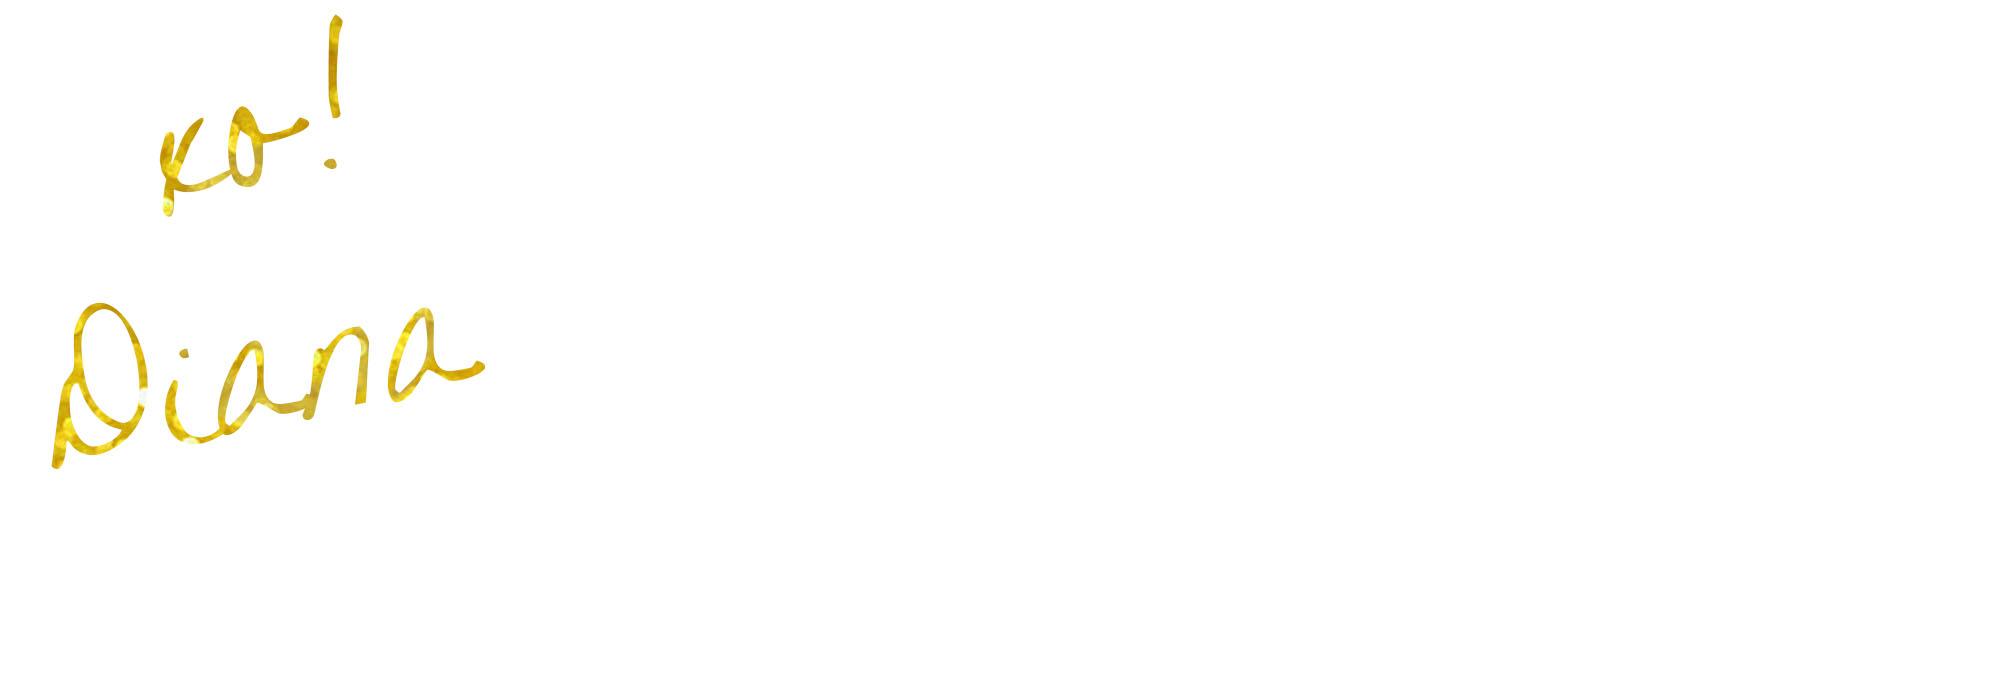 interior design blog, home decor blog, edmonton interior design blog, canadian interior design blog, interior design, home decor, new looks, home styling, house styling, room inspiration, design tips, design advice, decorate, decorating, style at  home, edmonton interior design, I have this thing with floors